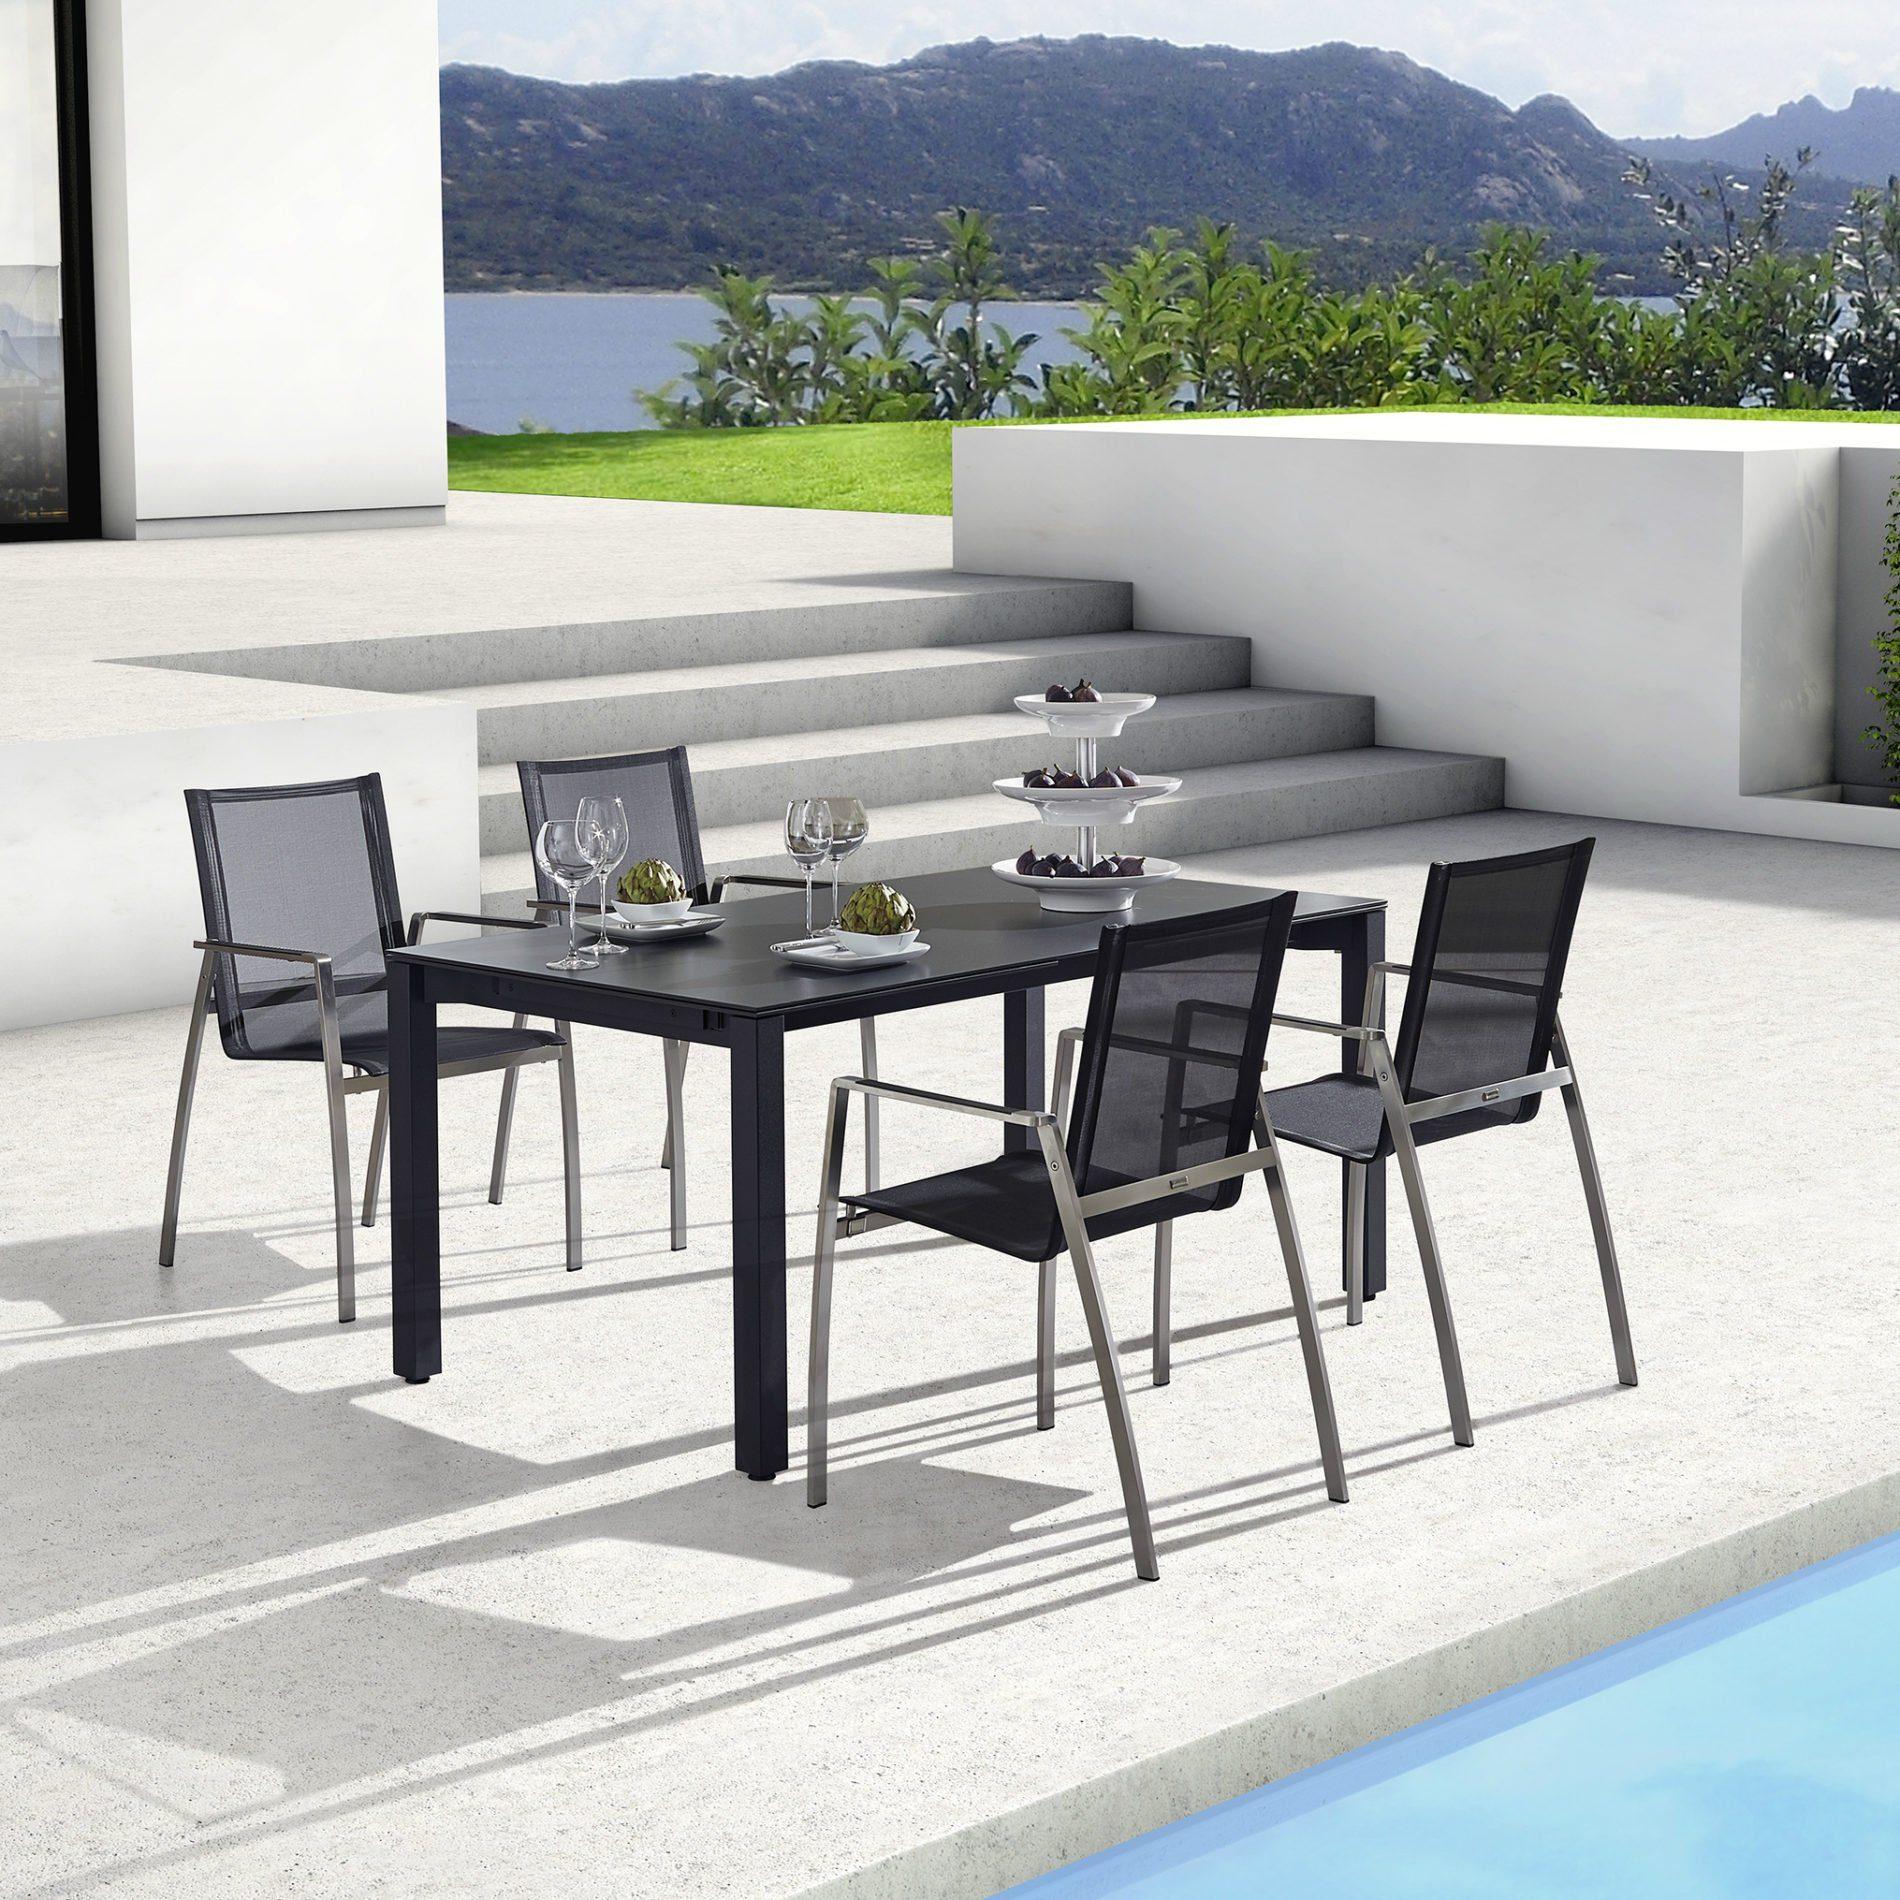 zumsteg atessa gartentisch edelstahl keramik ausziehbar plattenst rke 7 mm. Black Bedroom Furniture Sets. Home Design Ideas